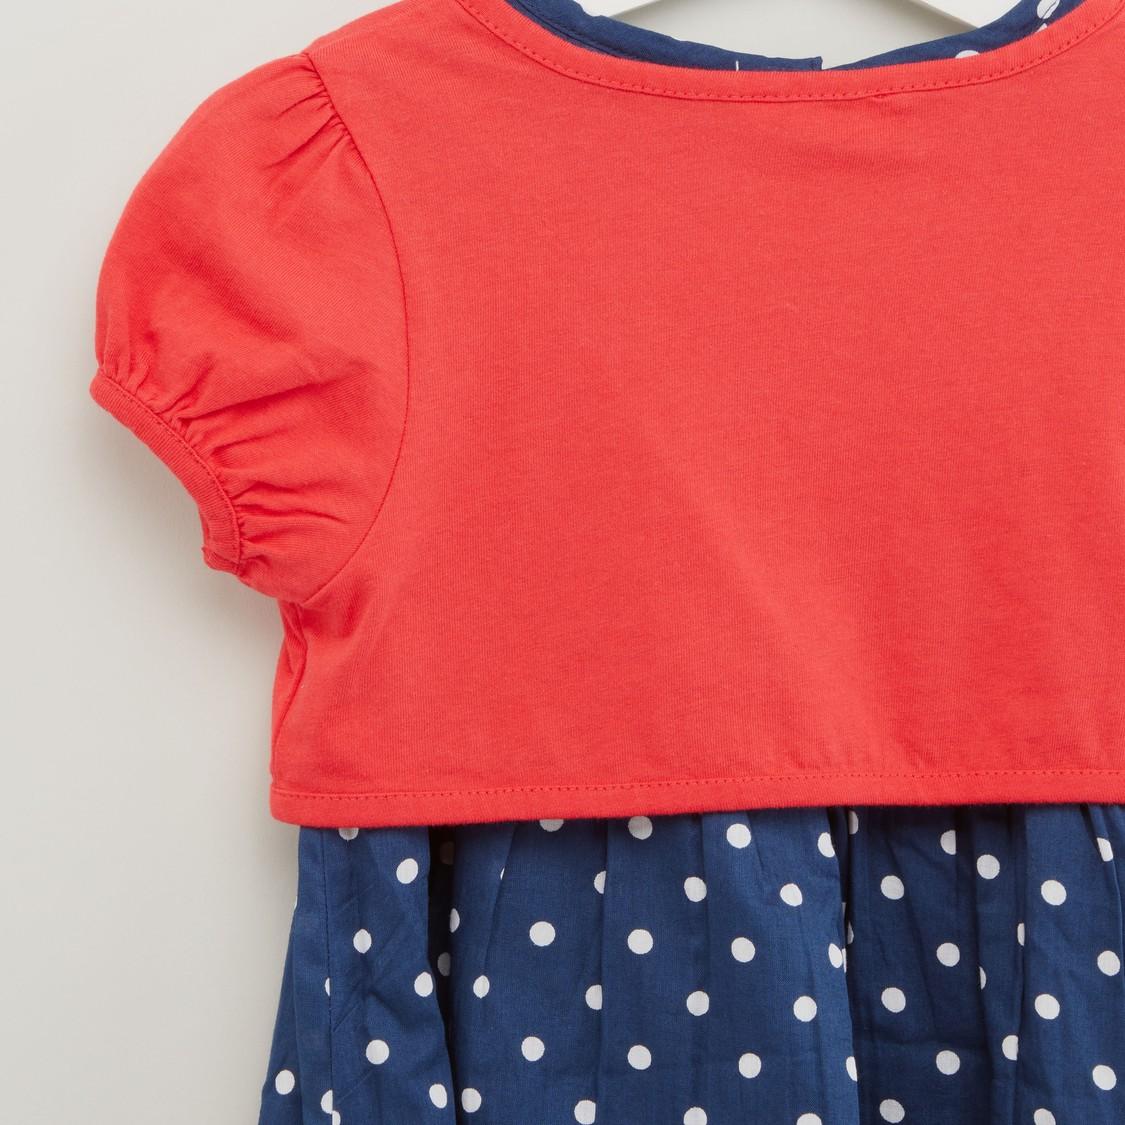 Polka Dots Print Dress with Shrug